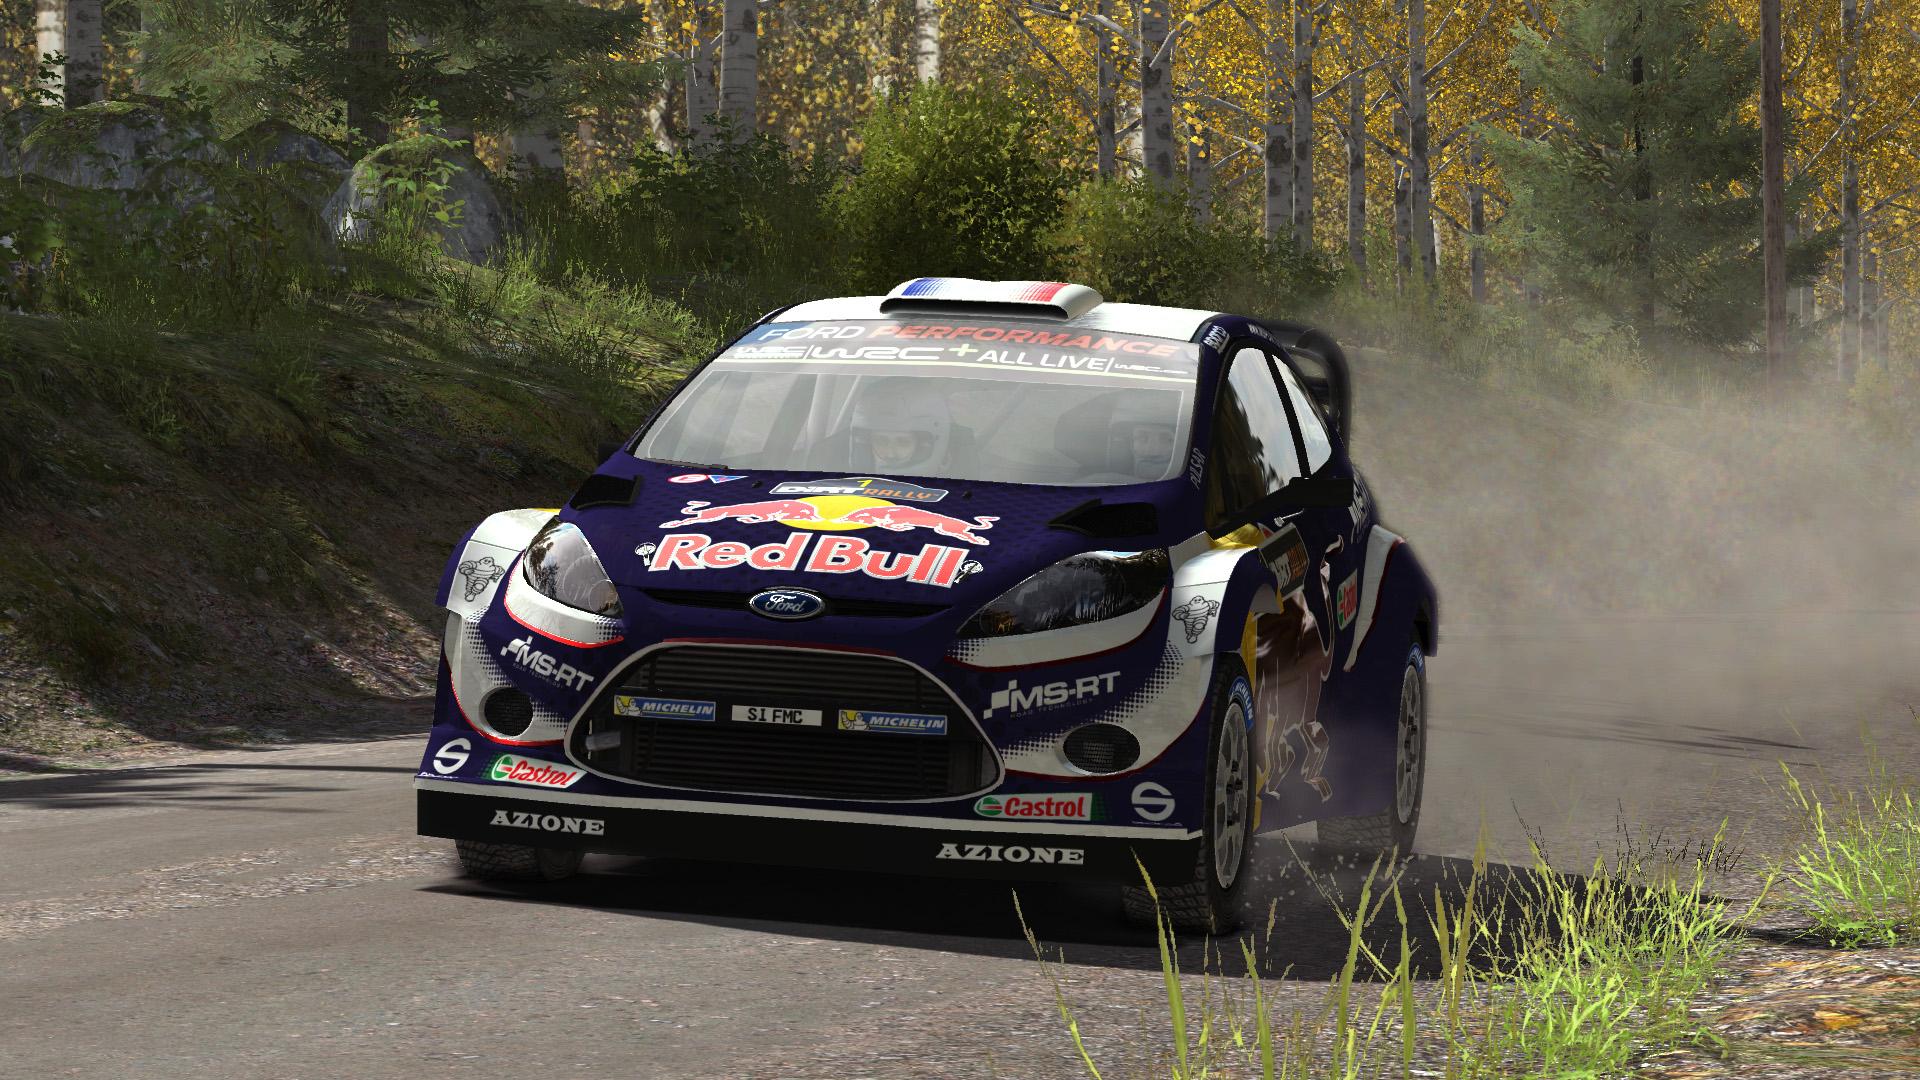 Ford Fiesta Wrc 2018 >> Ford Fiesta WRC M-SPORT 2018 | RaceDepartment